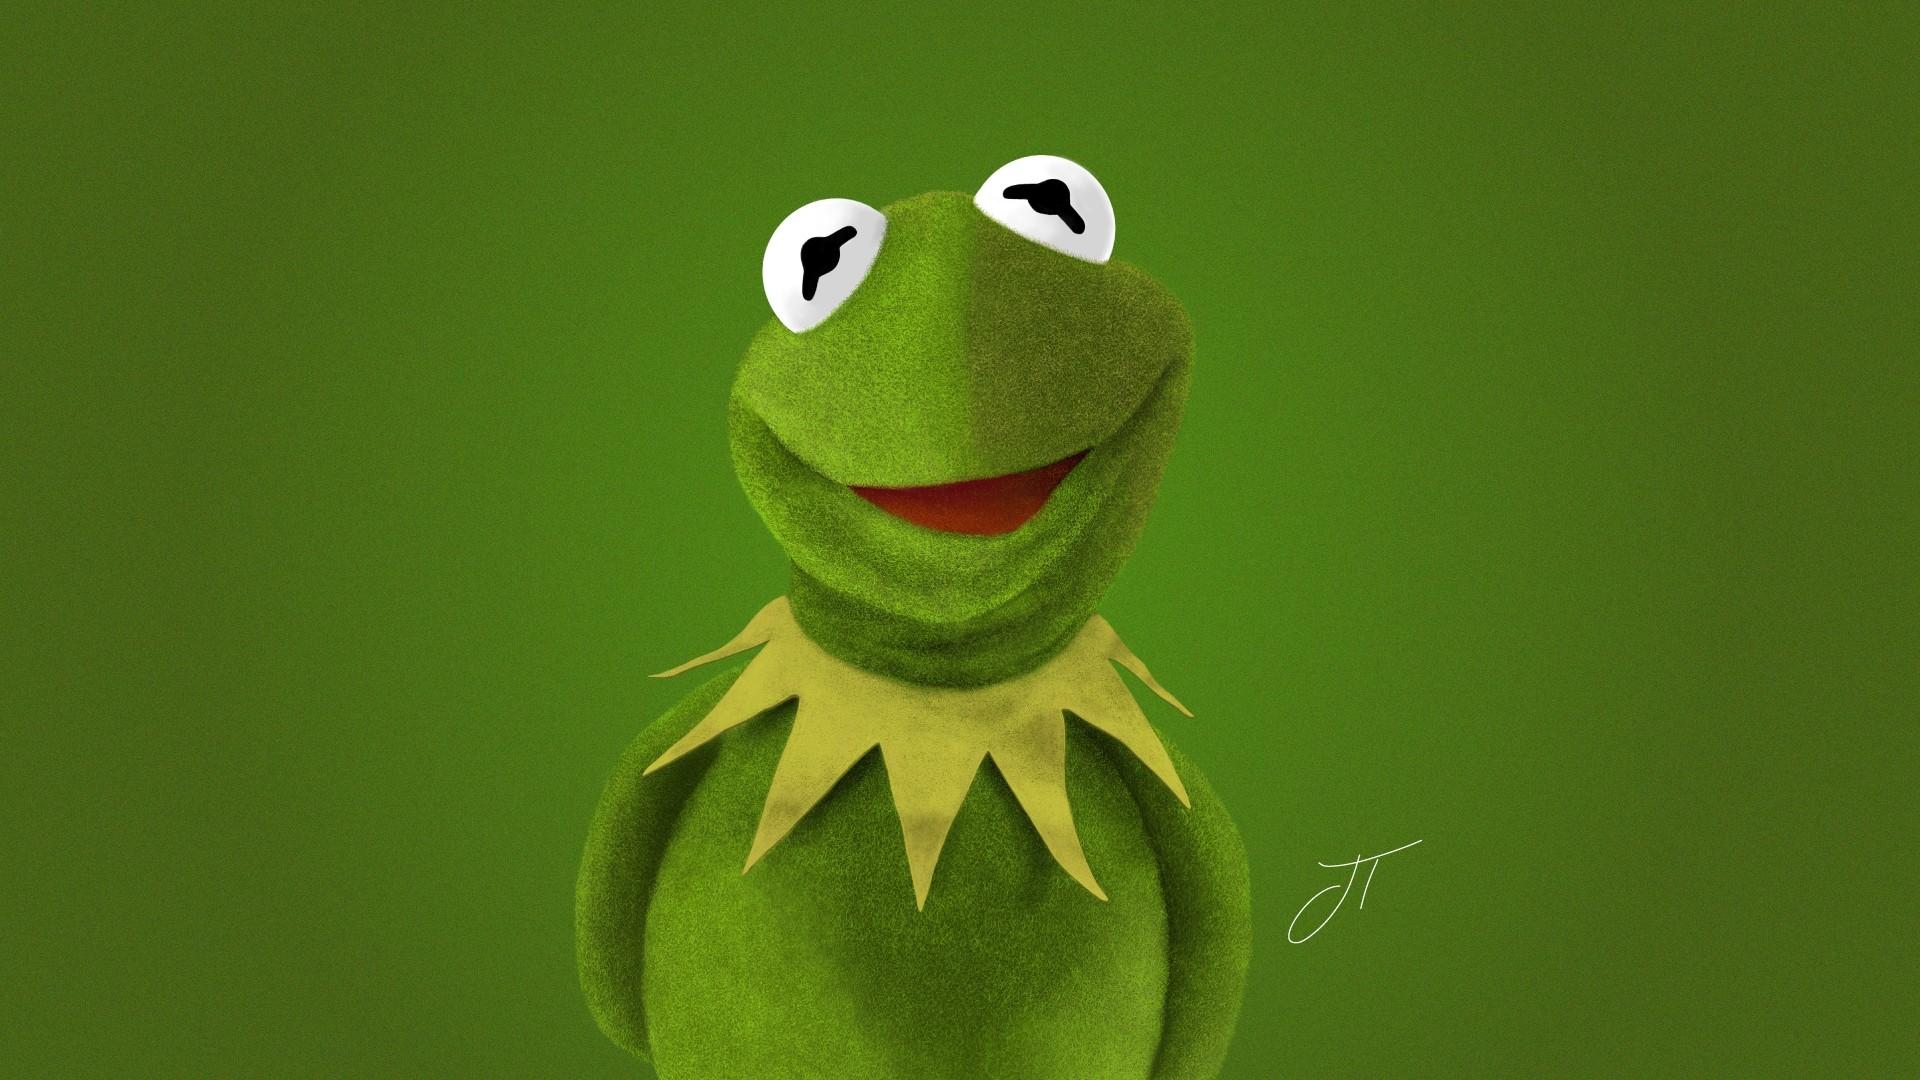 Hearts Kermit The Frog computer wallpaper